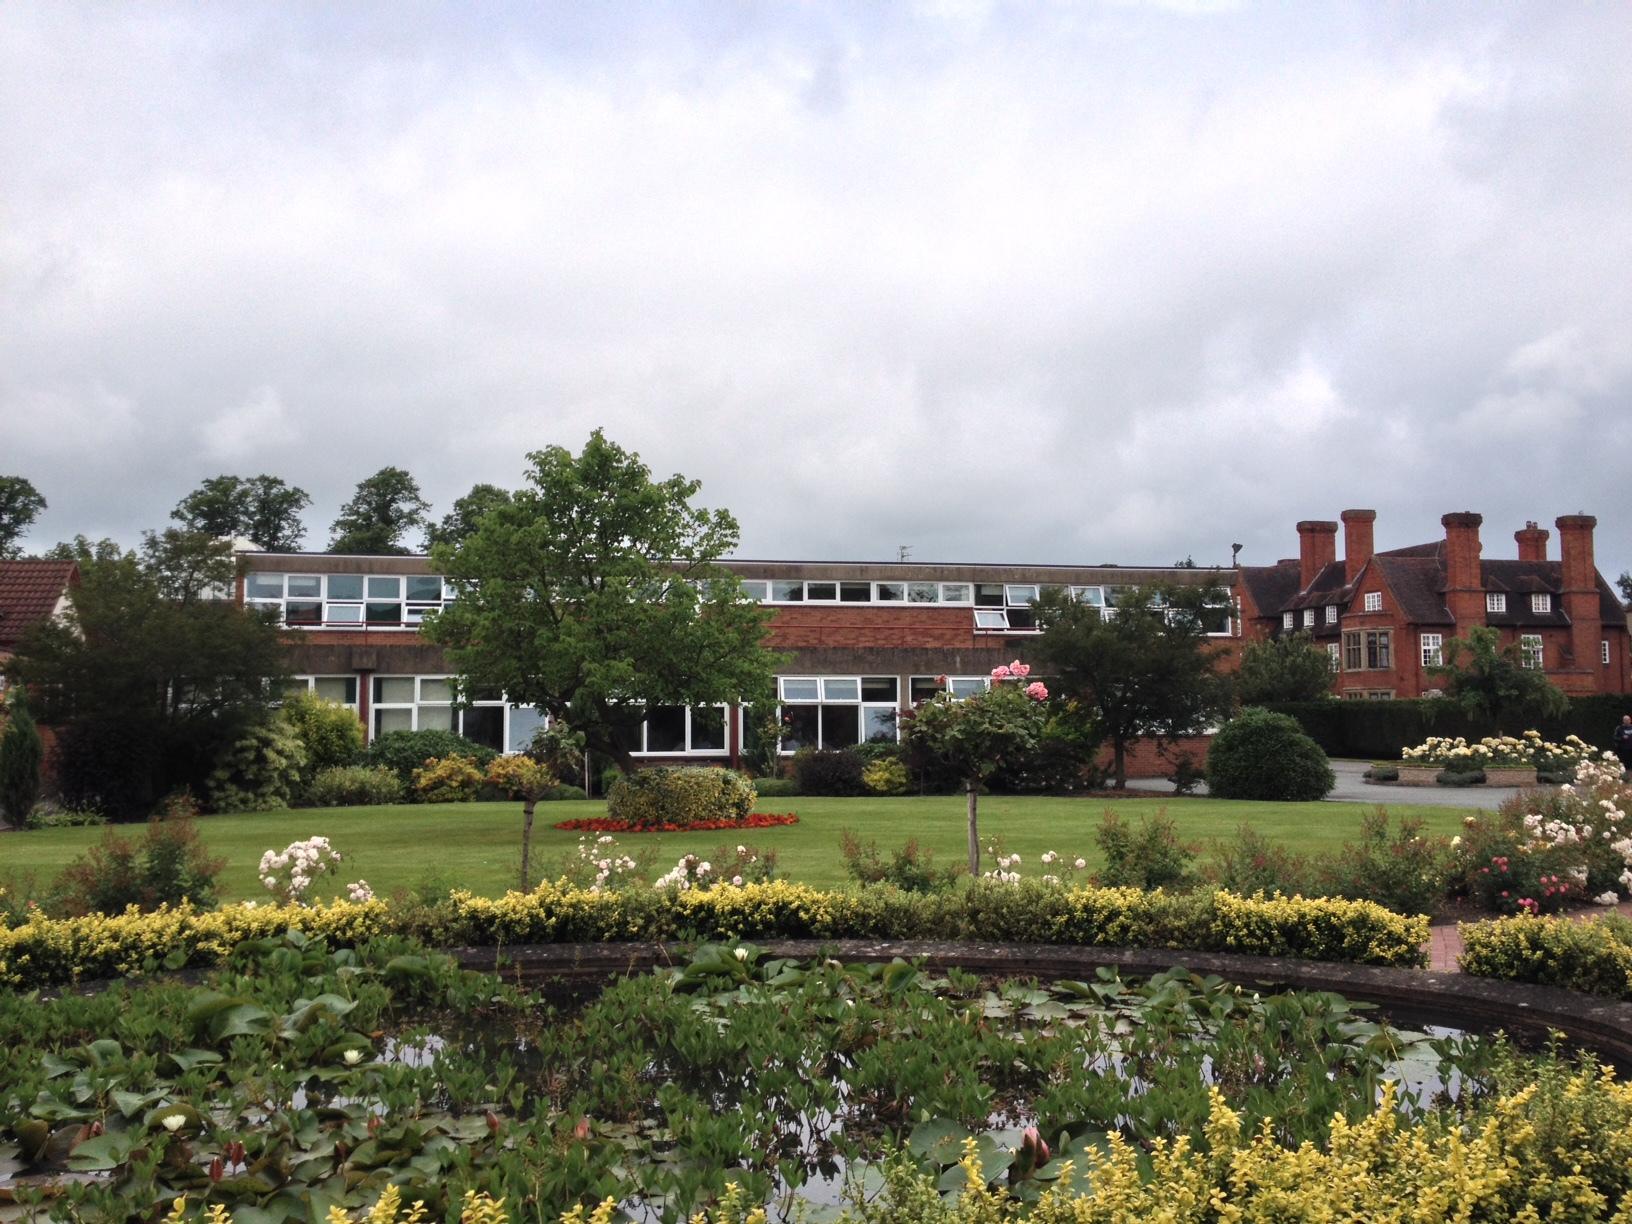 Existing Chatri Design Centre (Shrewsbury School) by Shrewsbury based architects Baart Harries Newall (BHN architects)